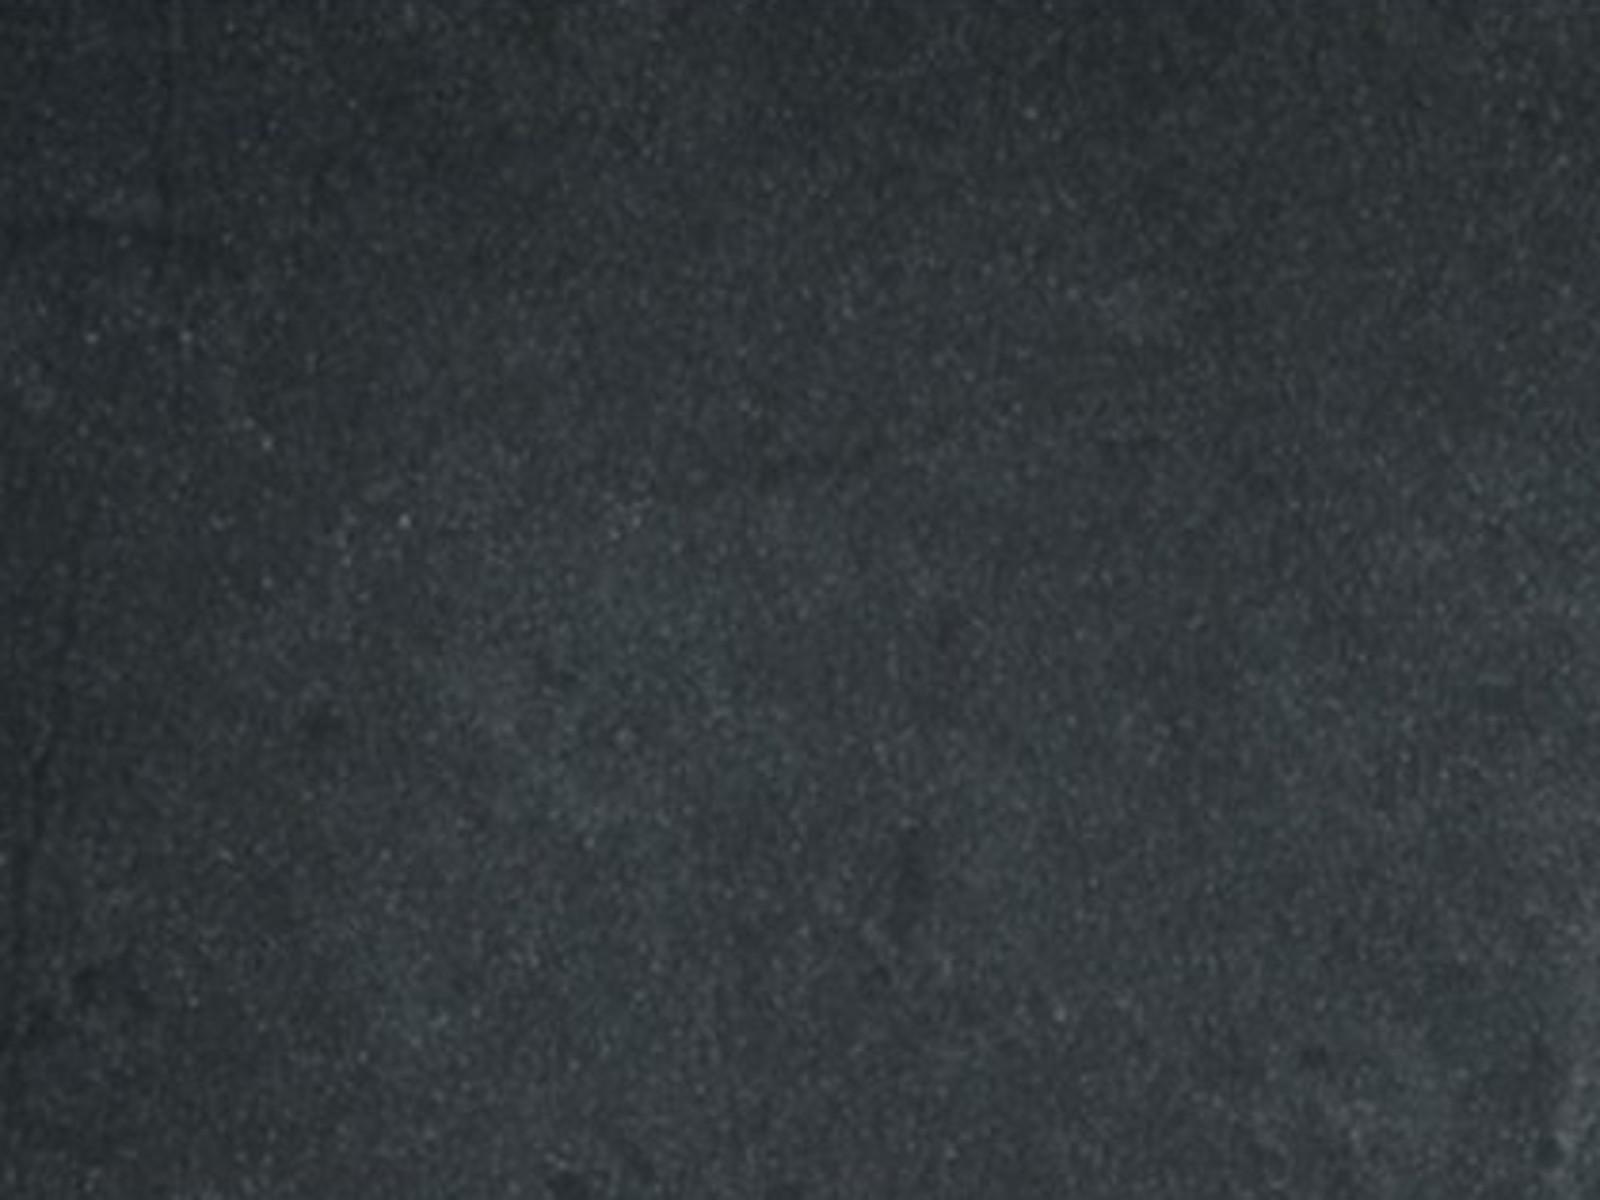 black stone nature